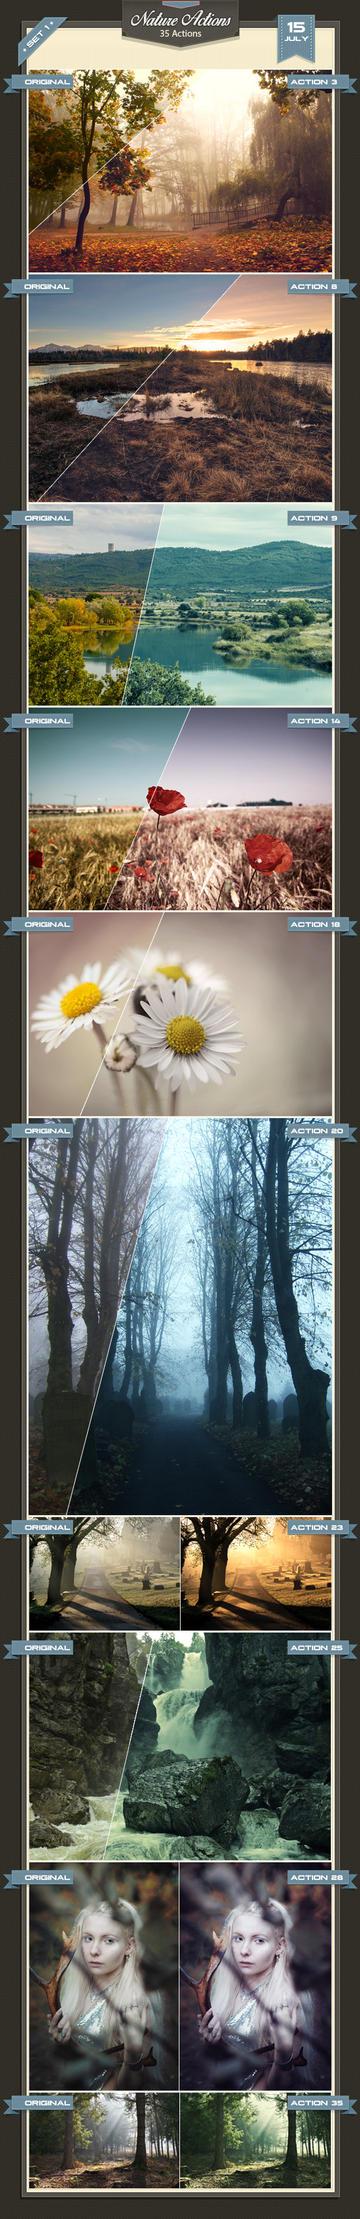 35 Nature Actions by baturaN